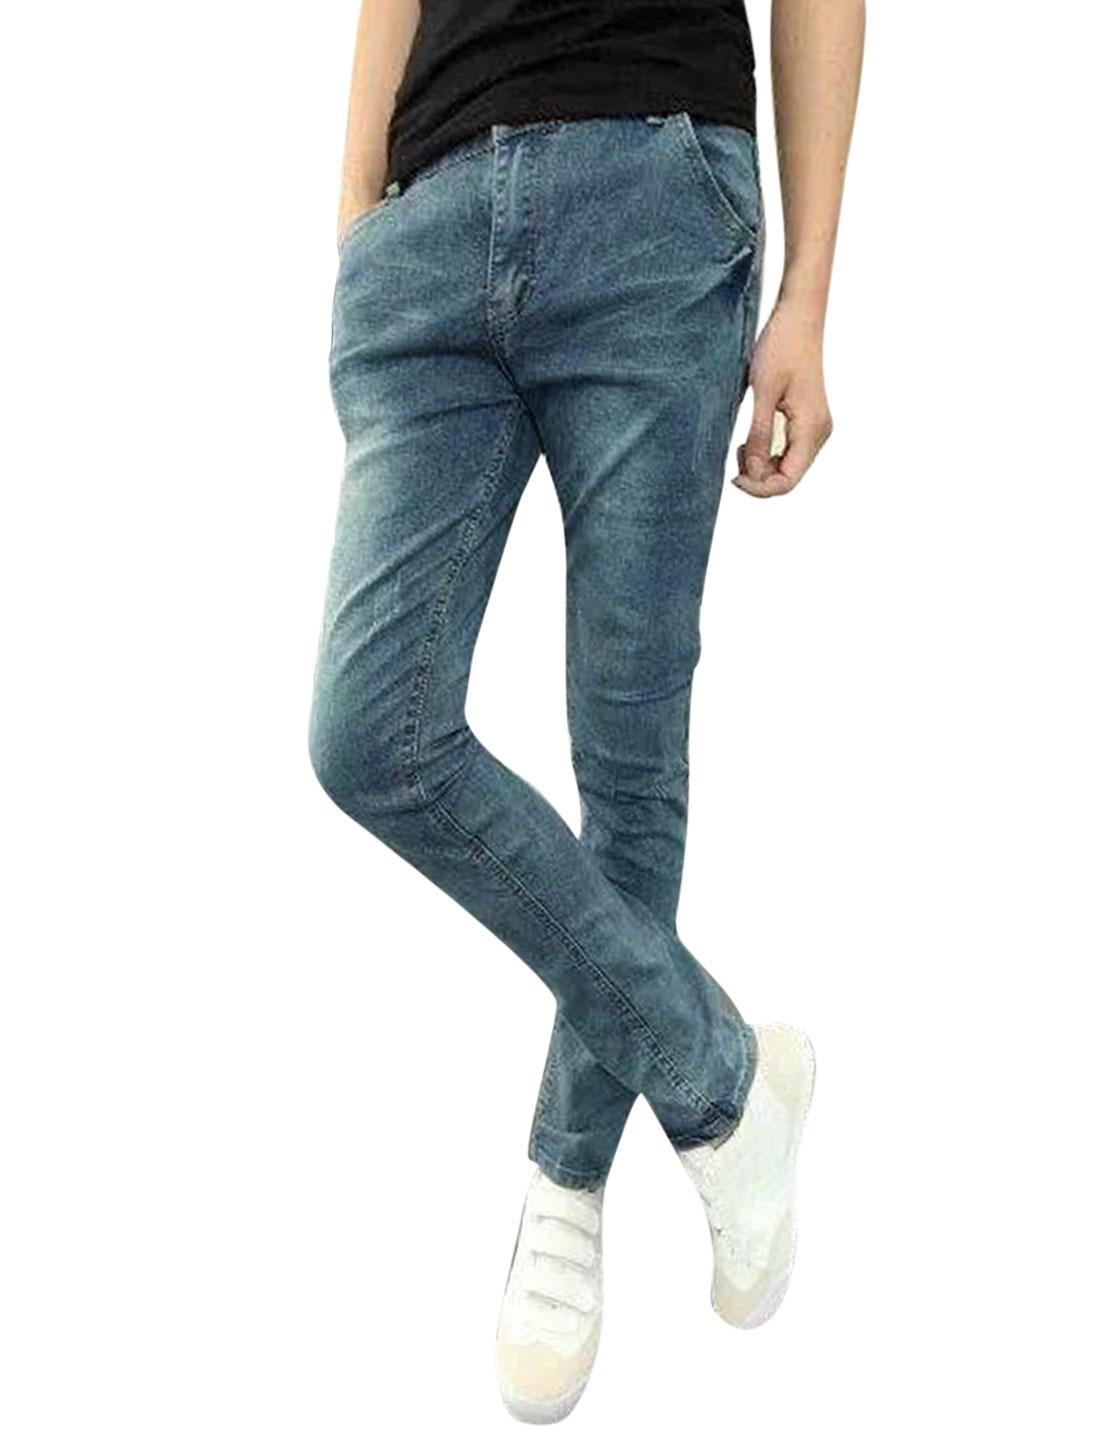 Men Mid Rise Classic Five Pockets Leisure Skinny Jeans Dark Blue W30